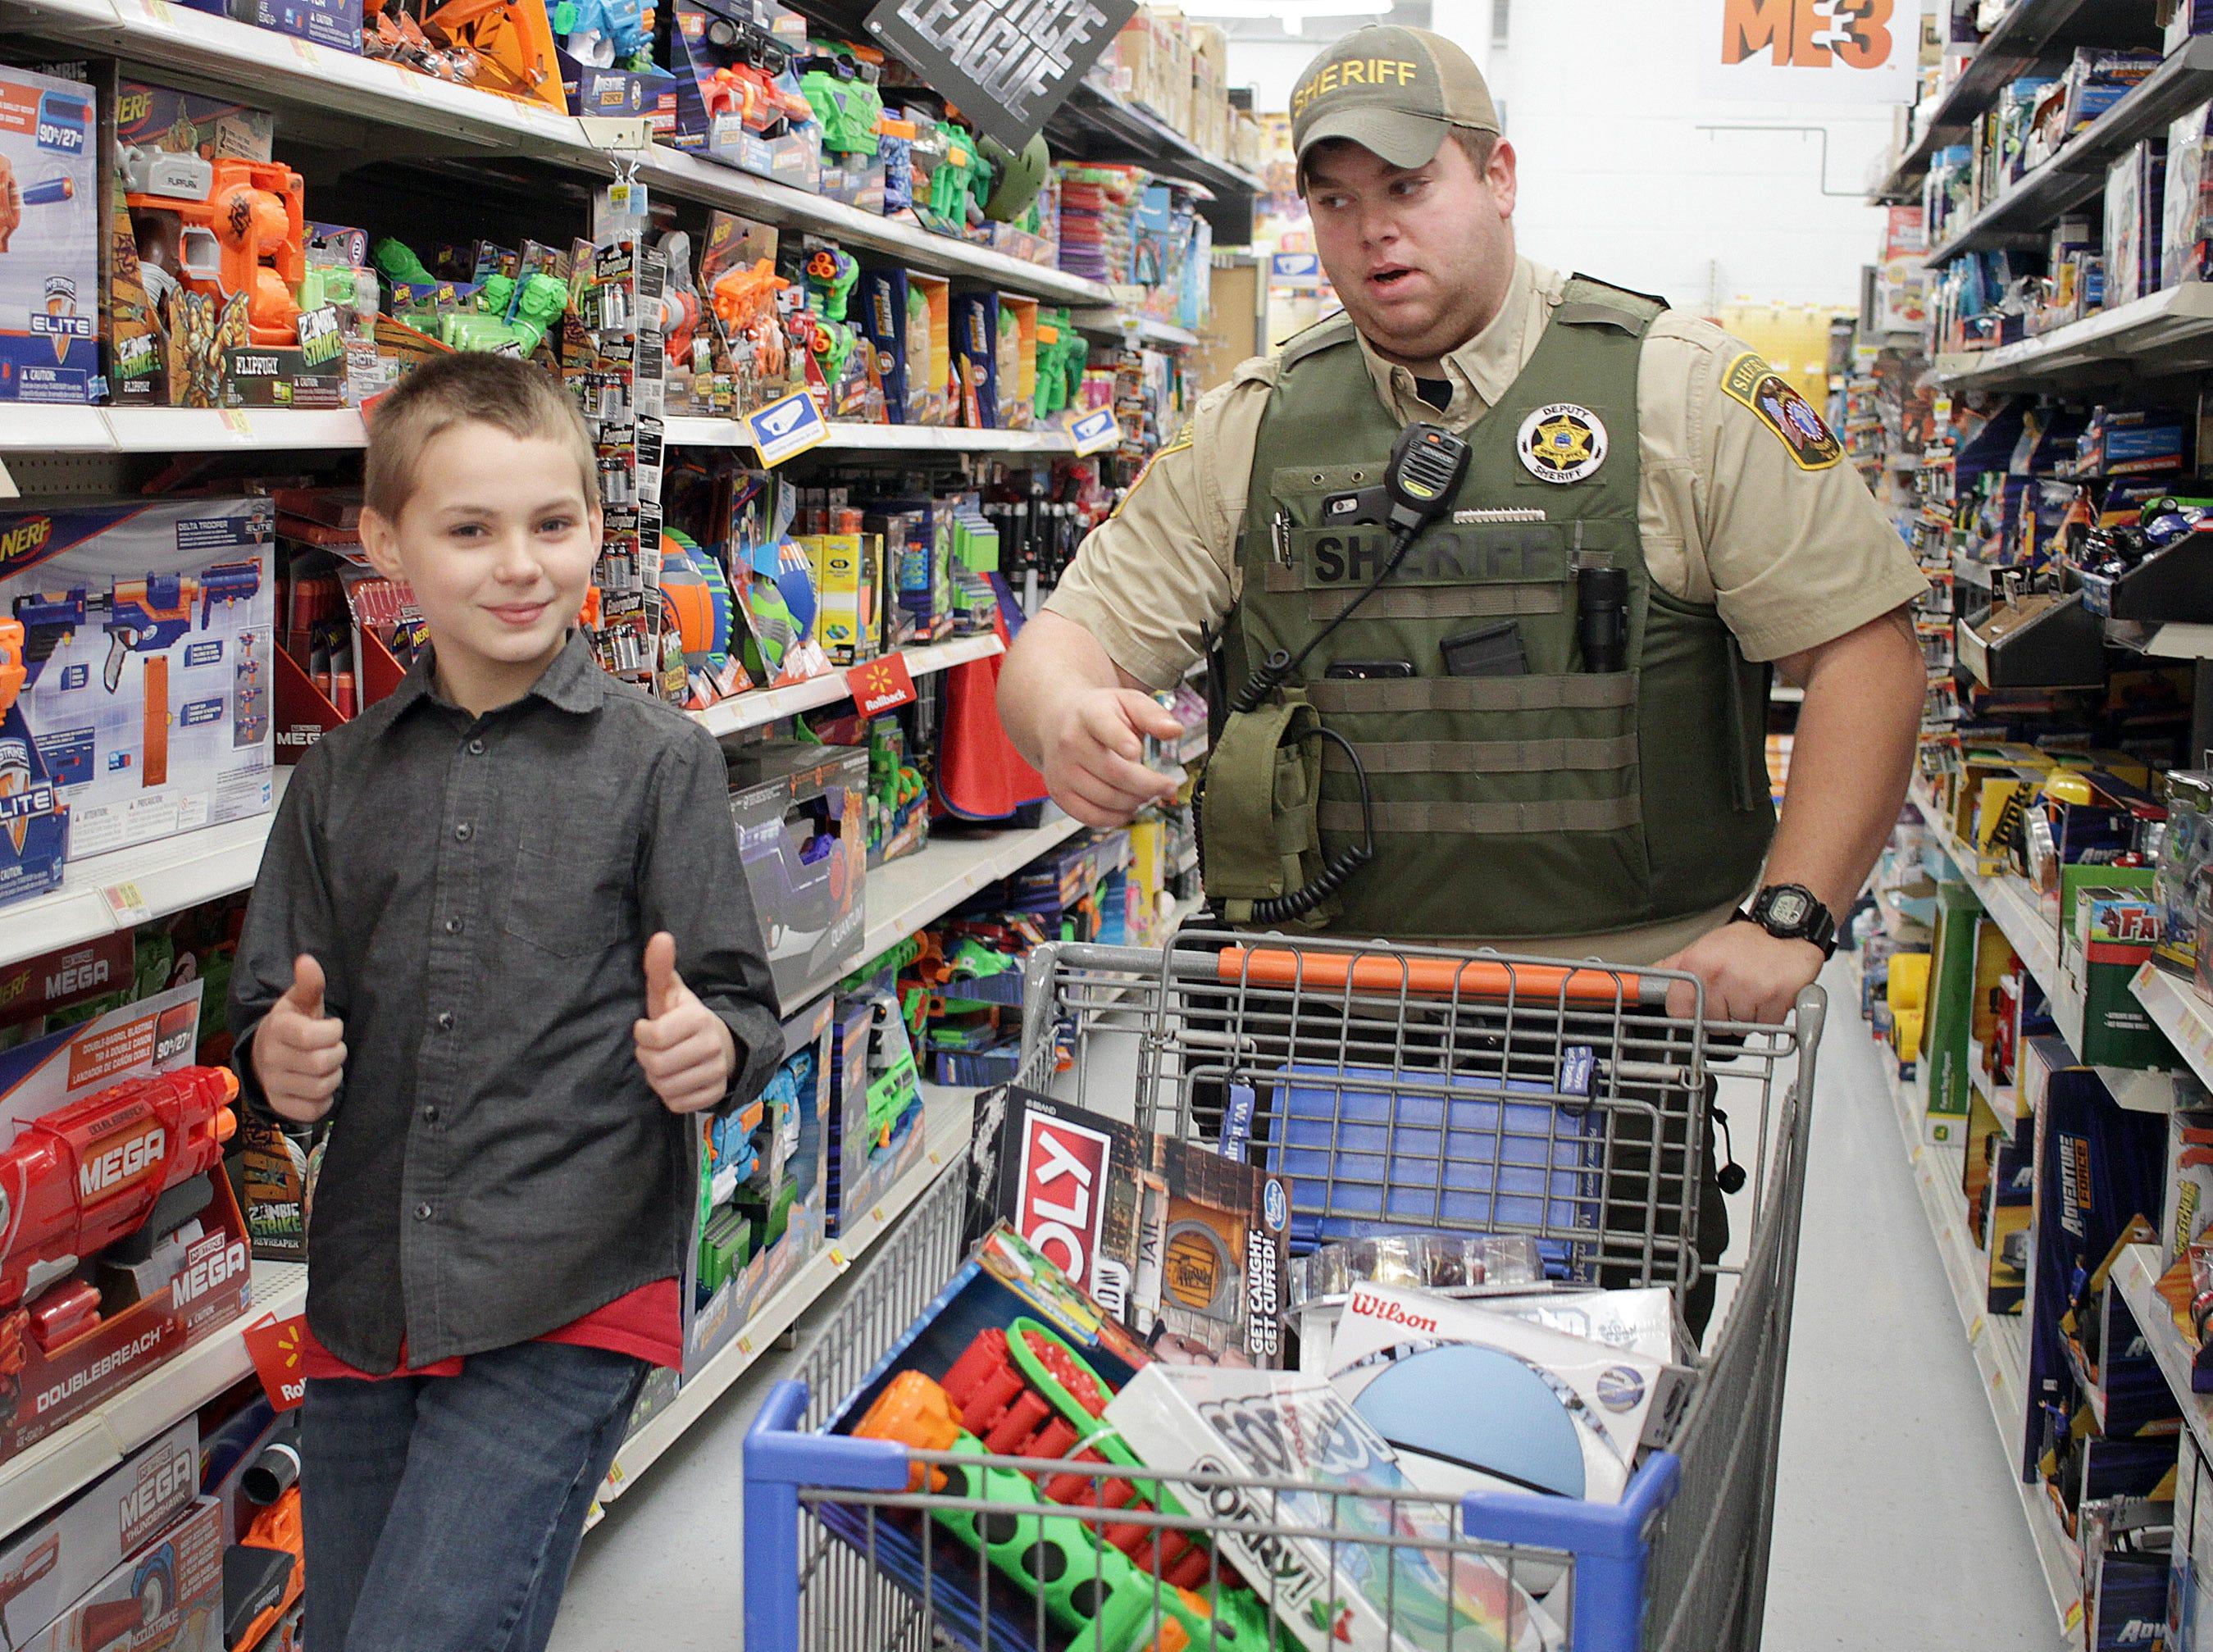 Asa Riggan shops with Deputy Josh Marriott at Shop with a Cop in Ashland City on Saturday, December 15, 2018.